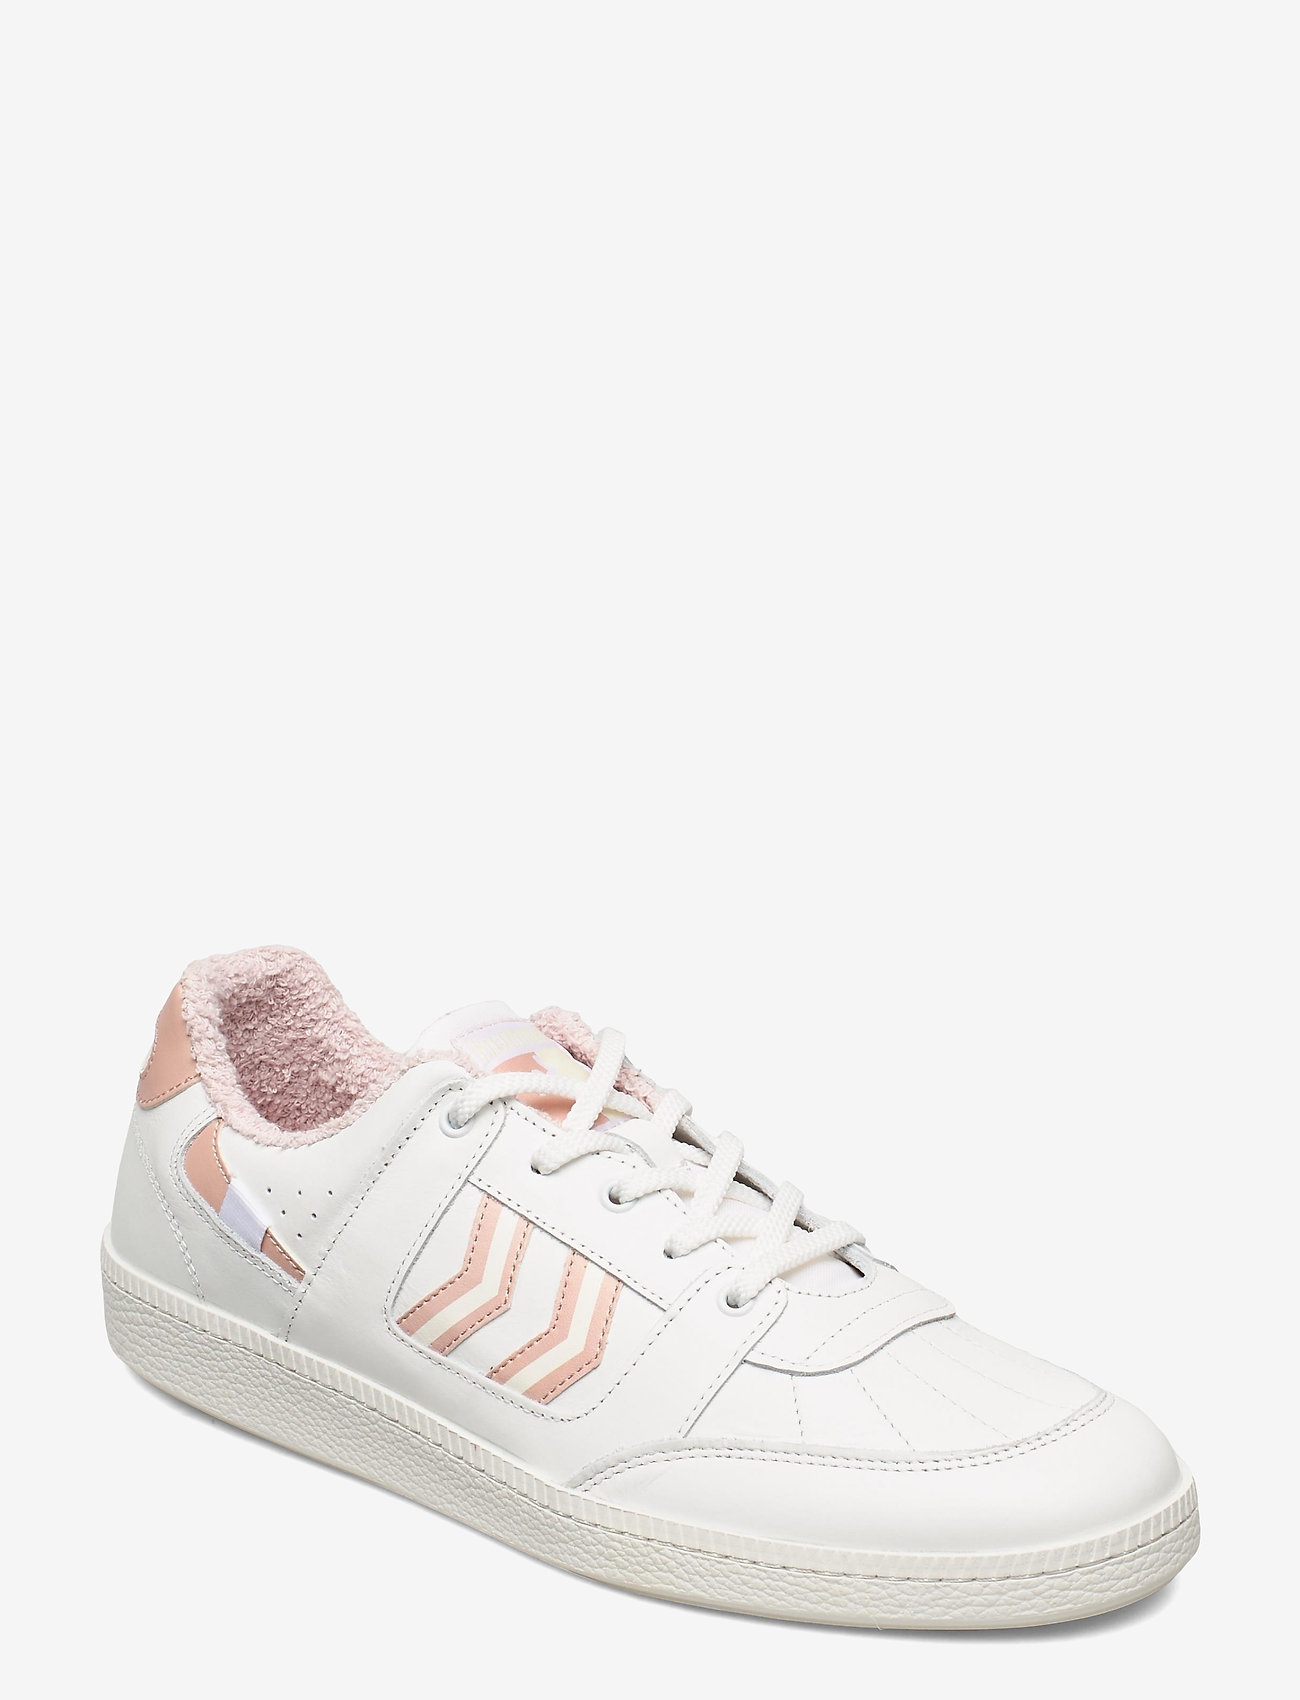 Hummel - SEOUL - laag sneakers - white - 1